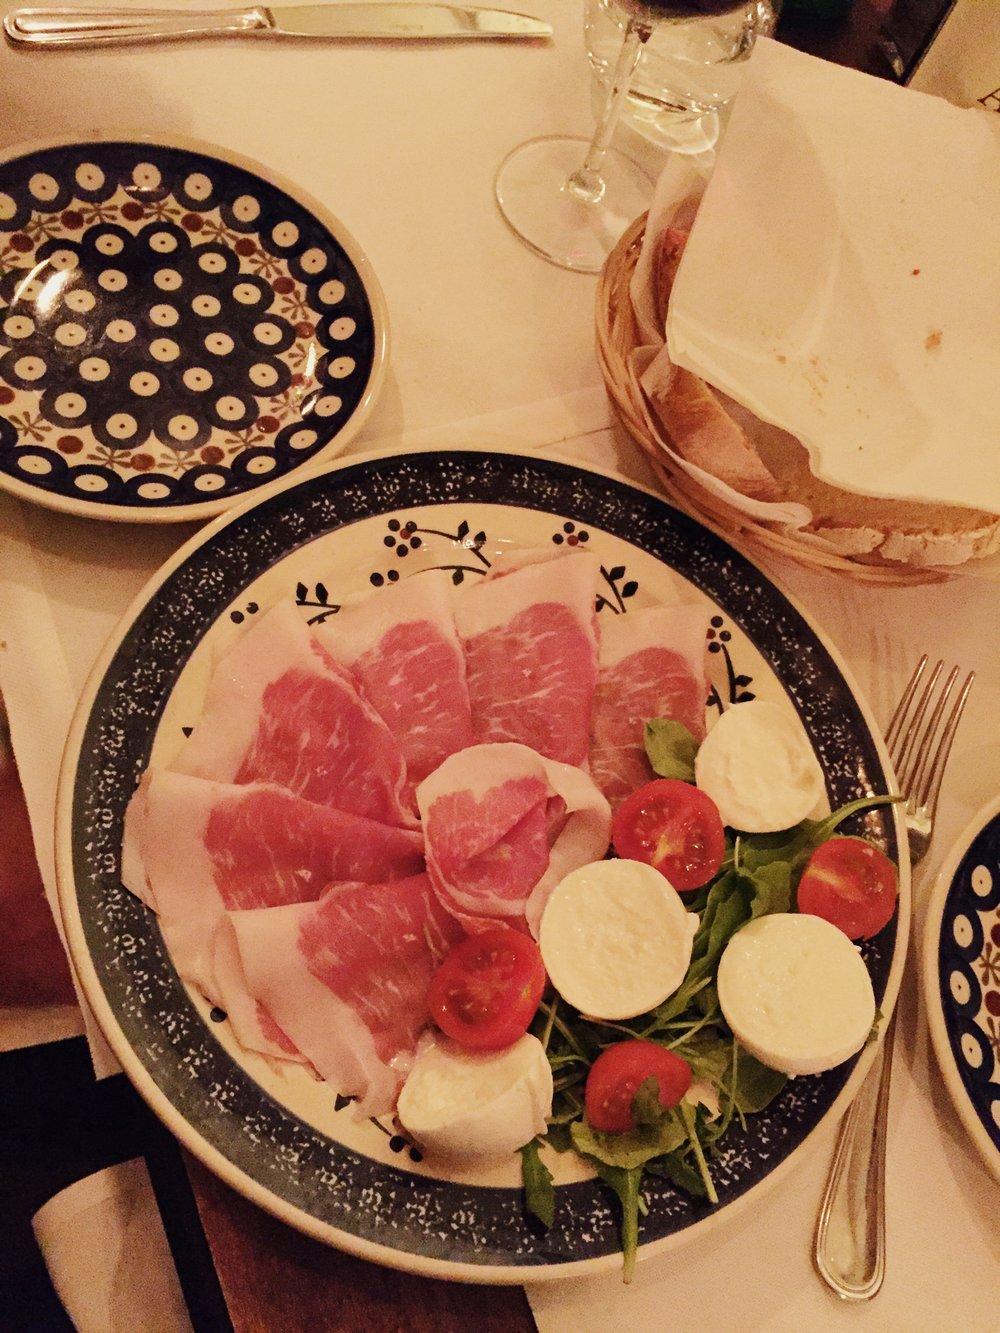 Angiolino Dinner Florence Prosciutto